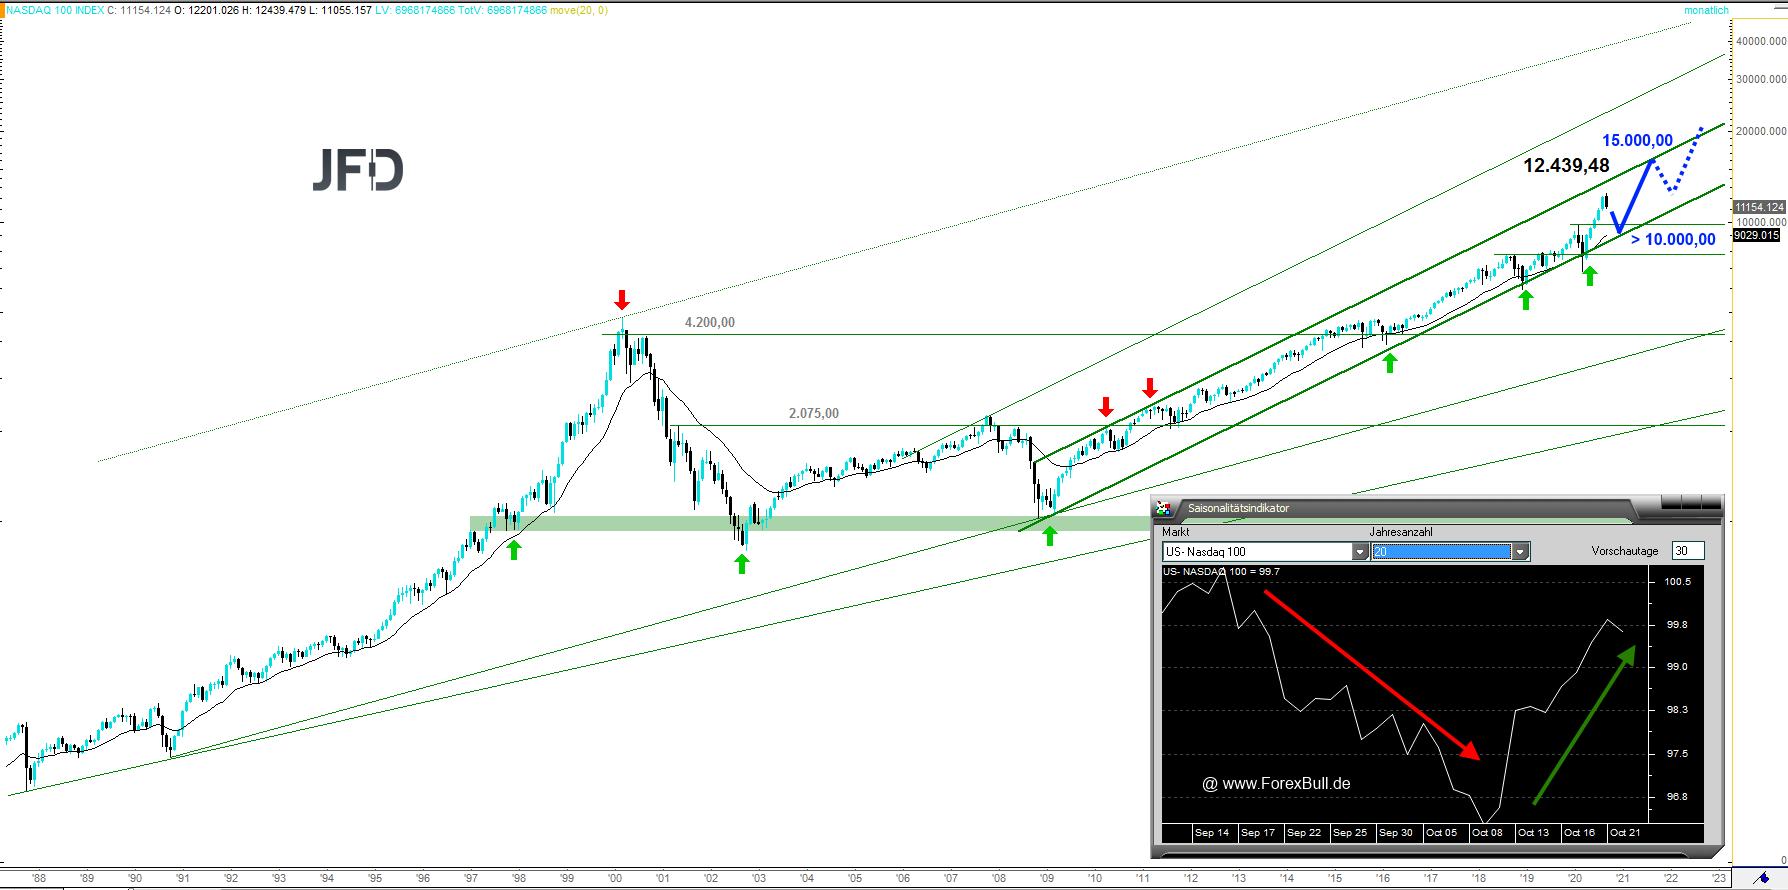 NASDAQ-100-mit-Big-Picture-Potenzial-NDX-Chartanalyse-Christian-Kämmerer-GodmodeTrader.de-2